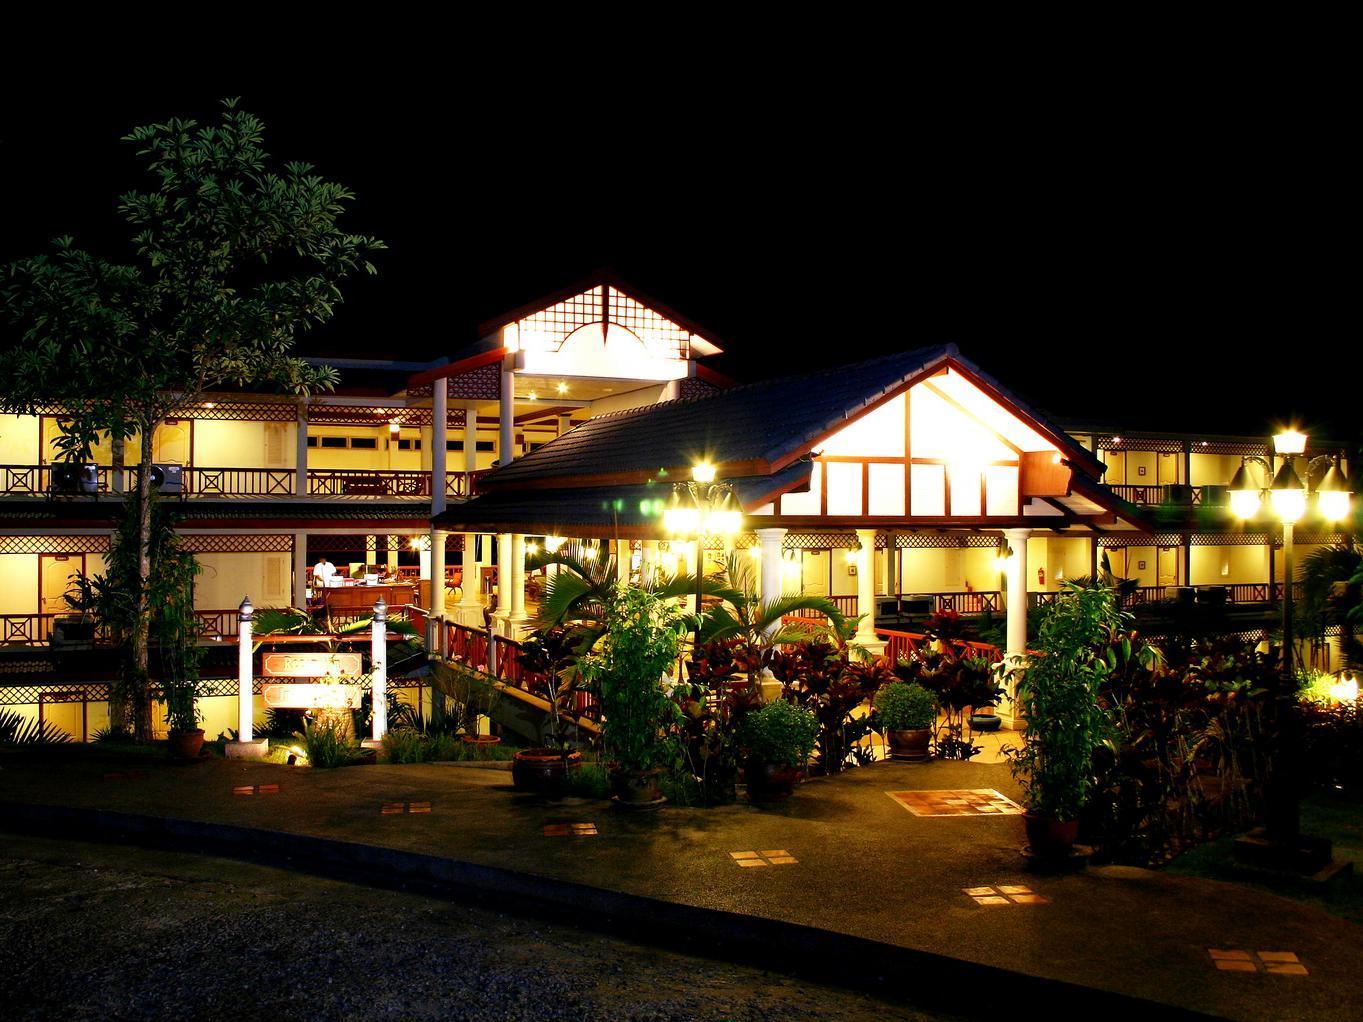 Khaolak Sunset Resort,เขาหลัก ซันเซ็ท รีสอร์ท